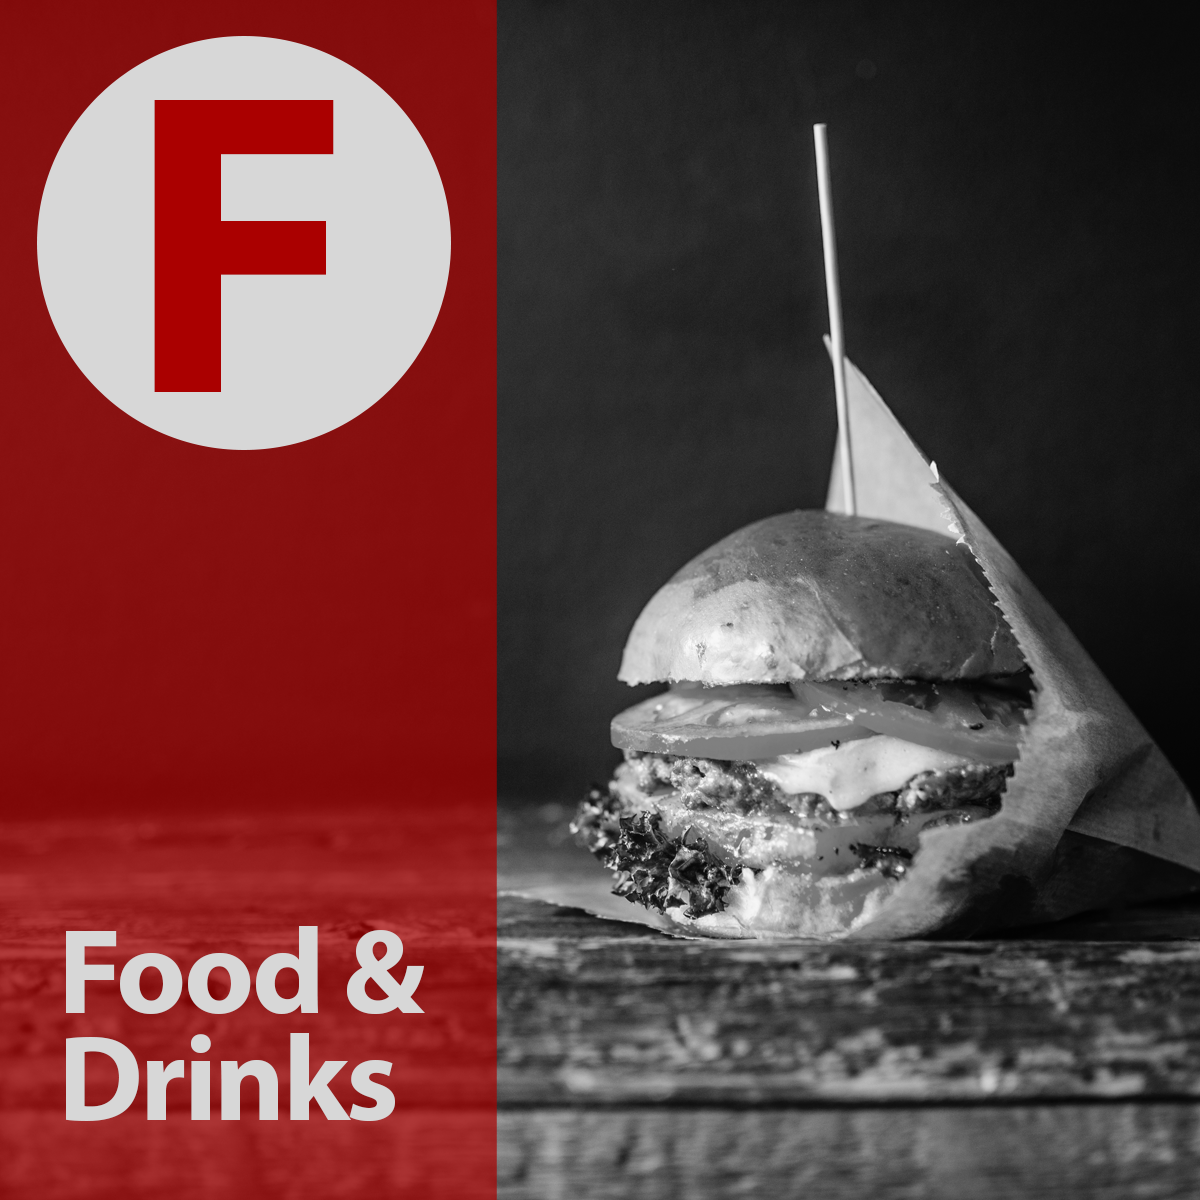 Food & Drinks Tile.png